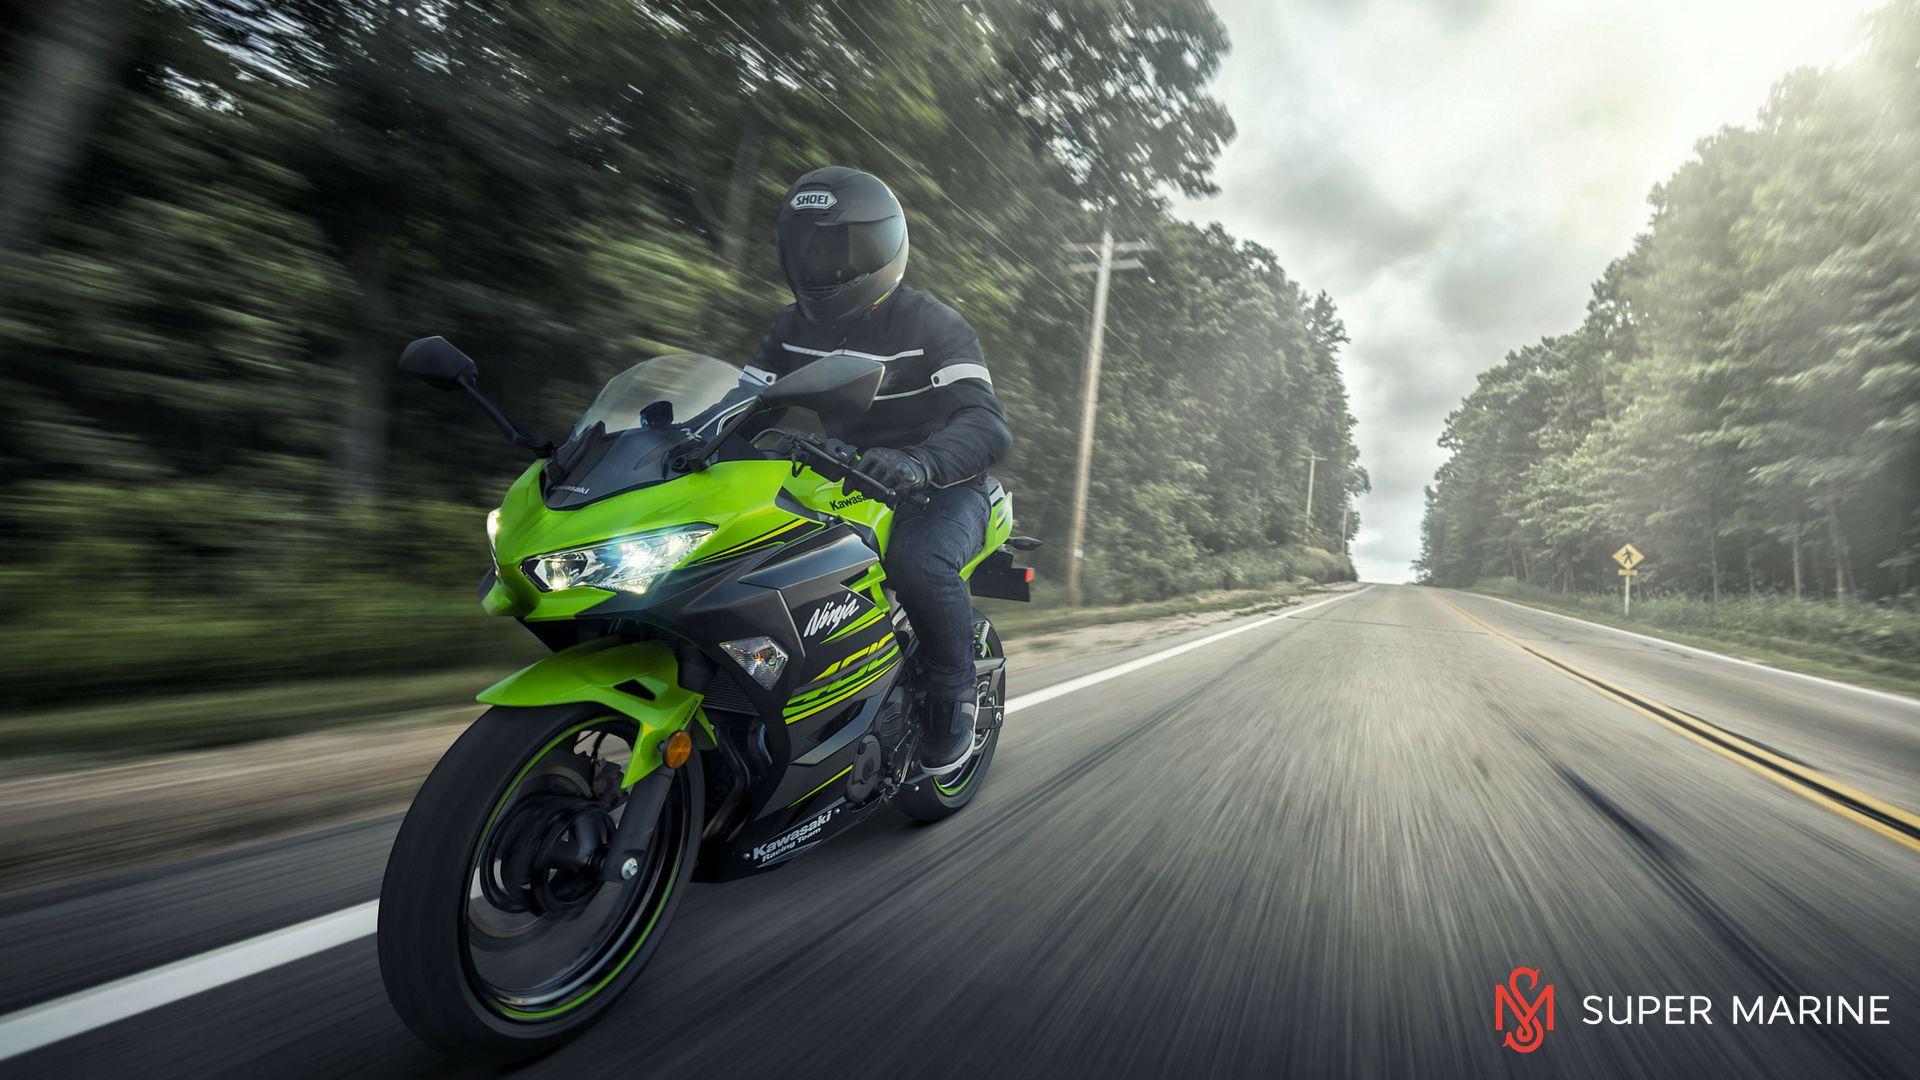 Мотоцикл Kawasaki Ninja 400 Зеленый 2020 - 11